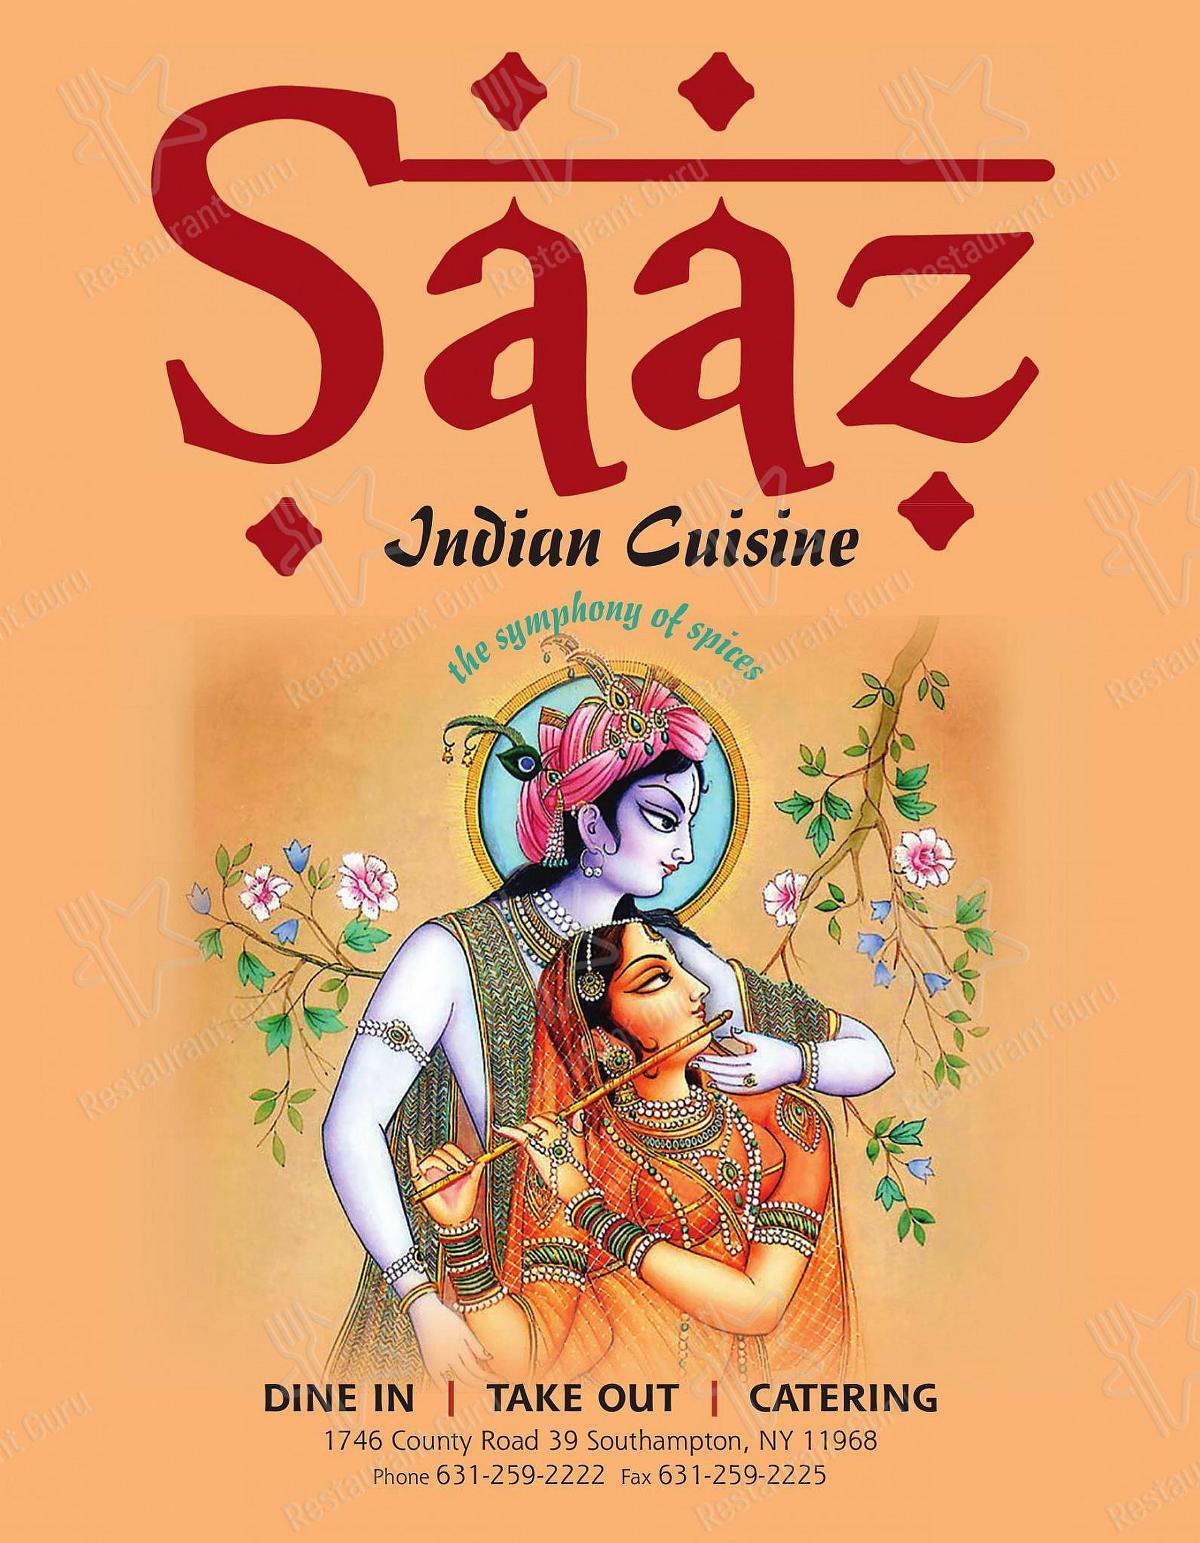 Saaz menu - meals and drinks